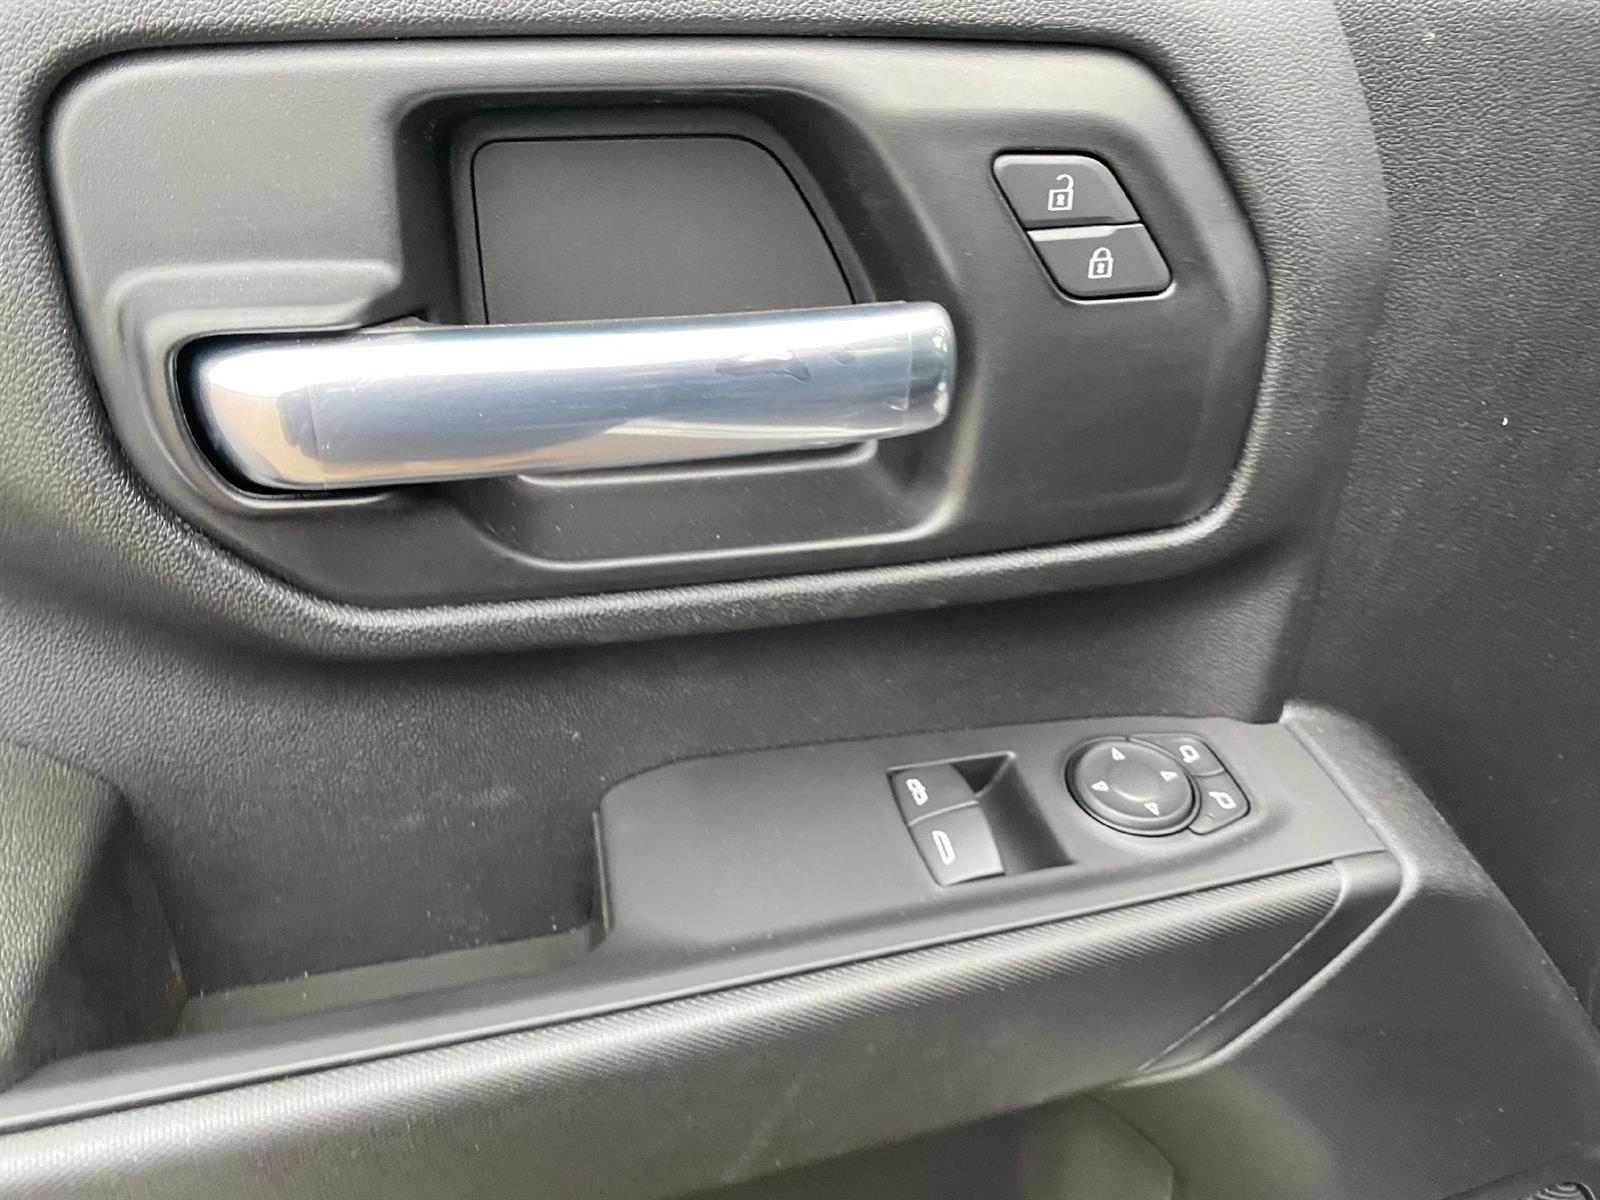 2021 Chevrolet Silverado 2500 Regular Cab 4x4, Pickup #89089 - photo 5